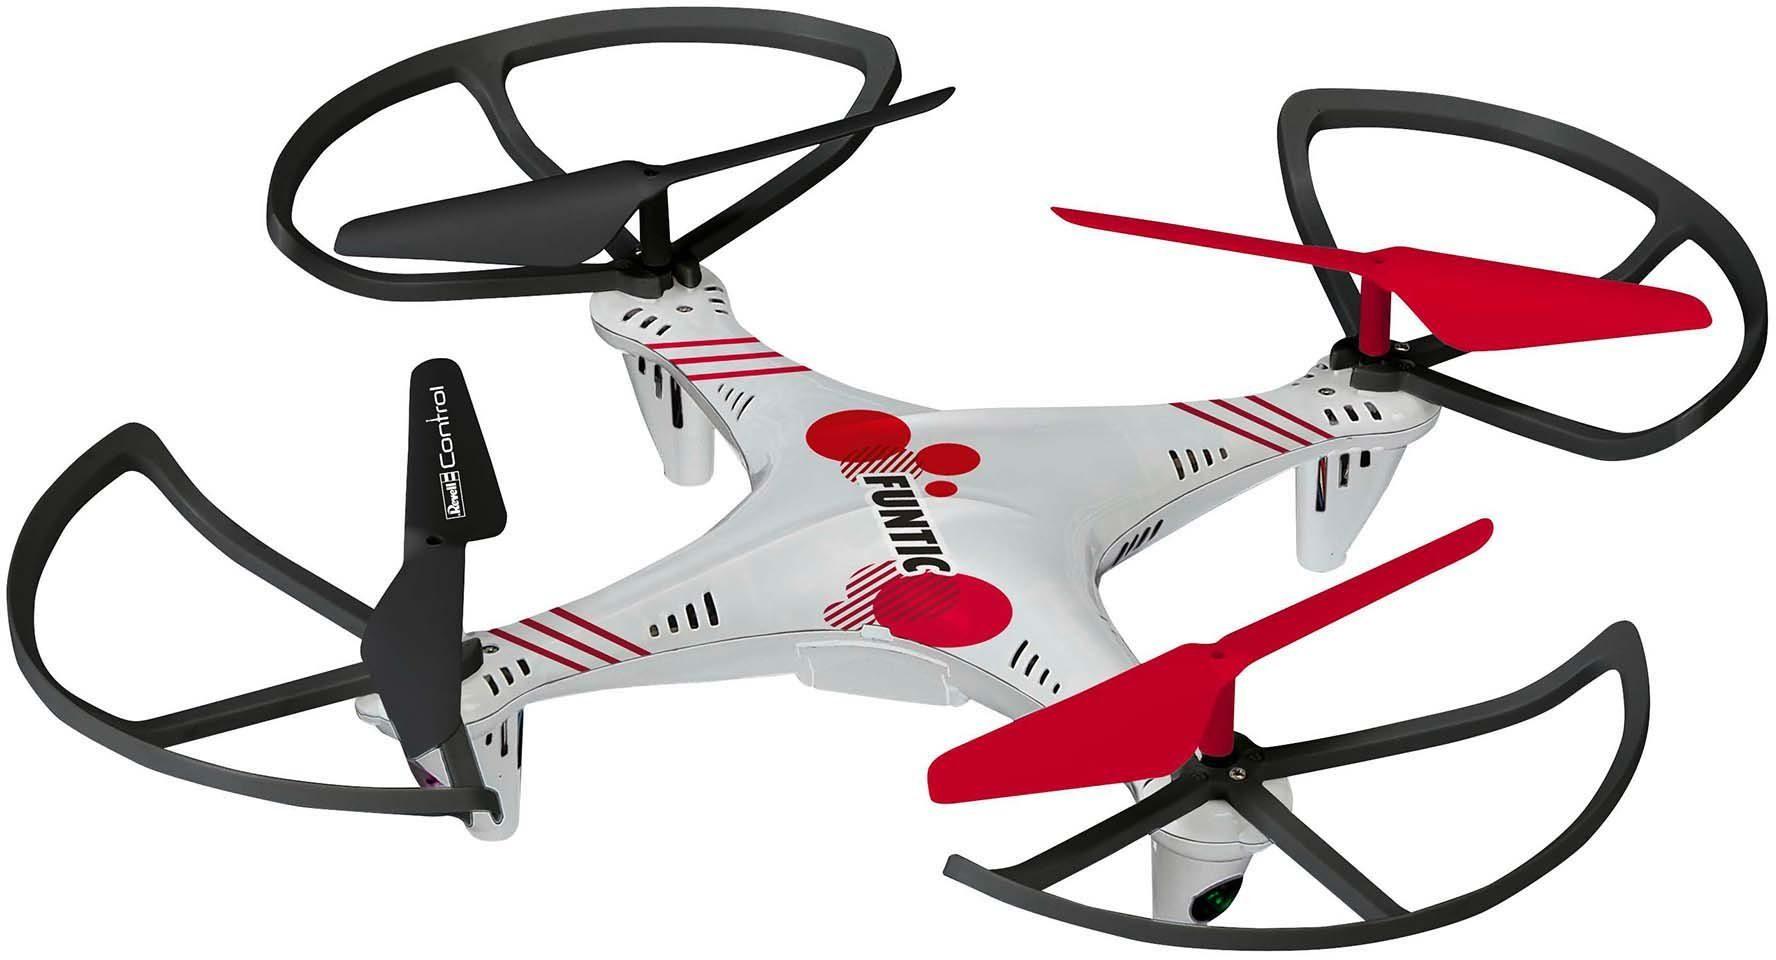 Revell® Control, RC-Quadcopter inkl. Ersatzrotor-Set und USB-Ladegerät, »Funtic«